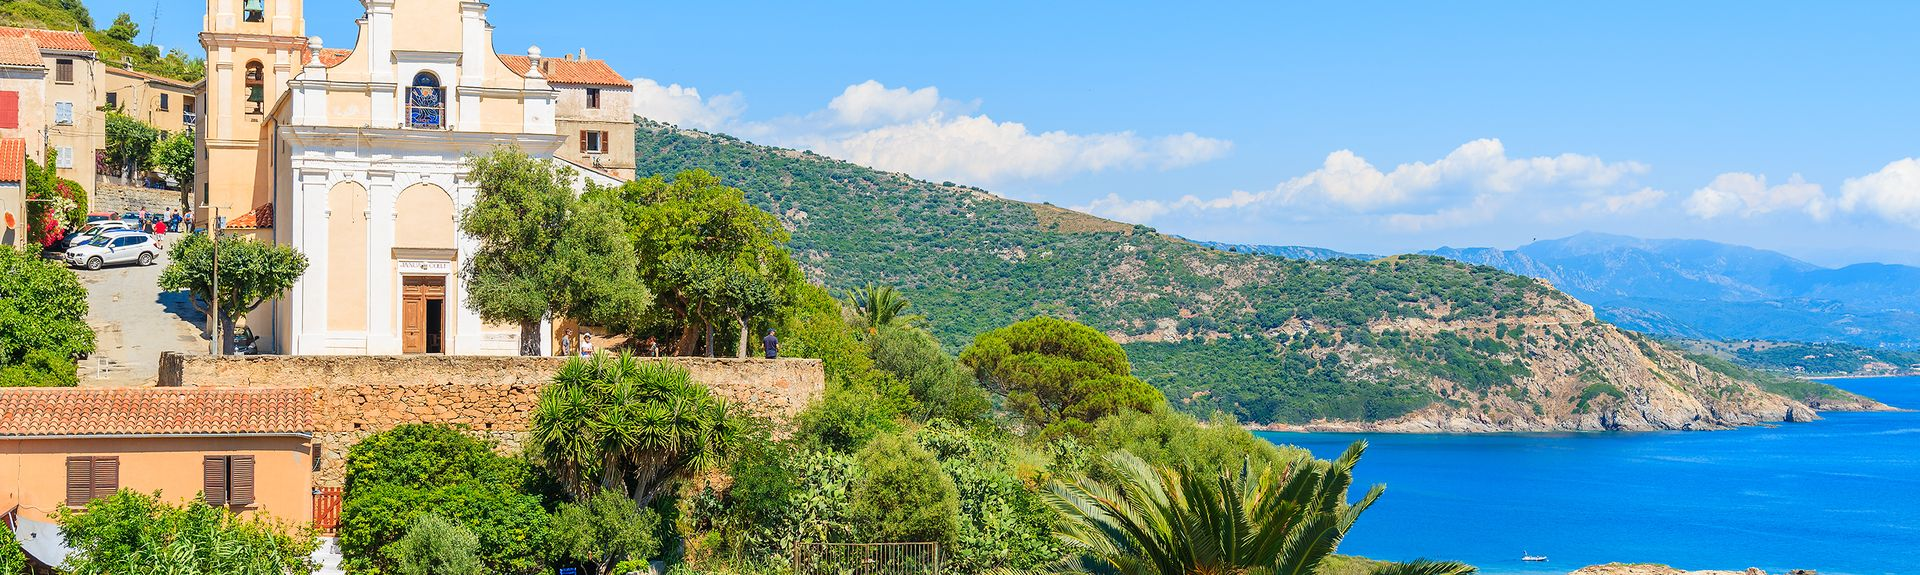 Cargese, Corse-du-Sud, France